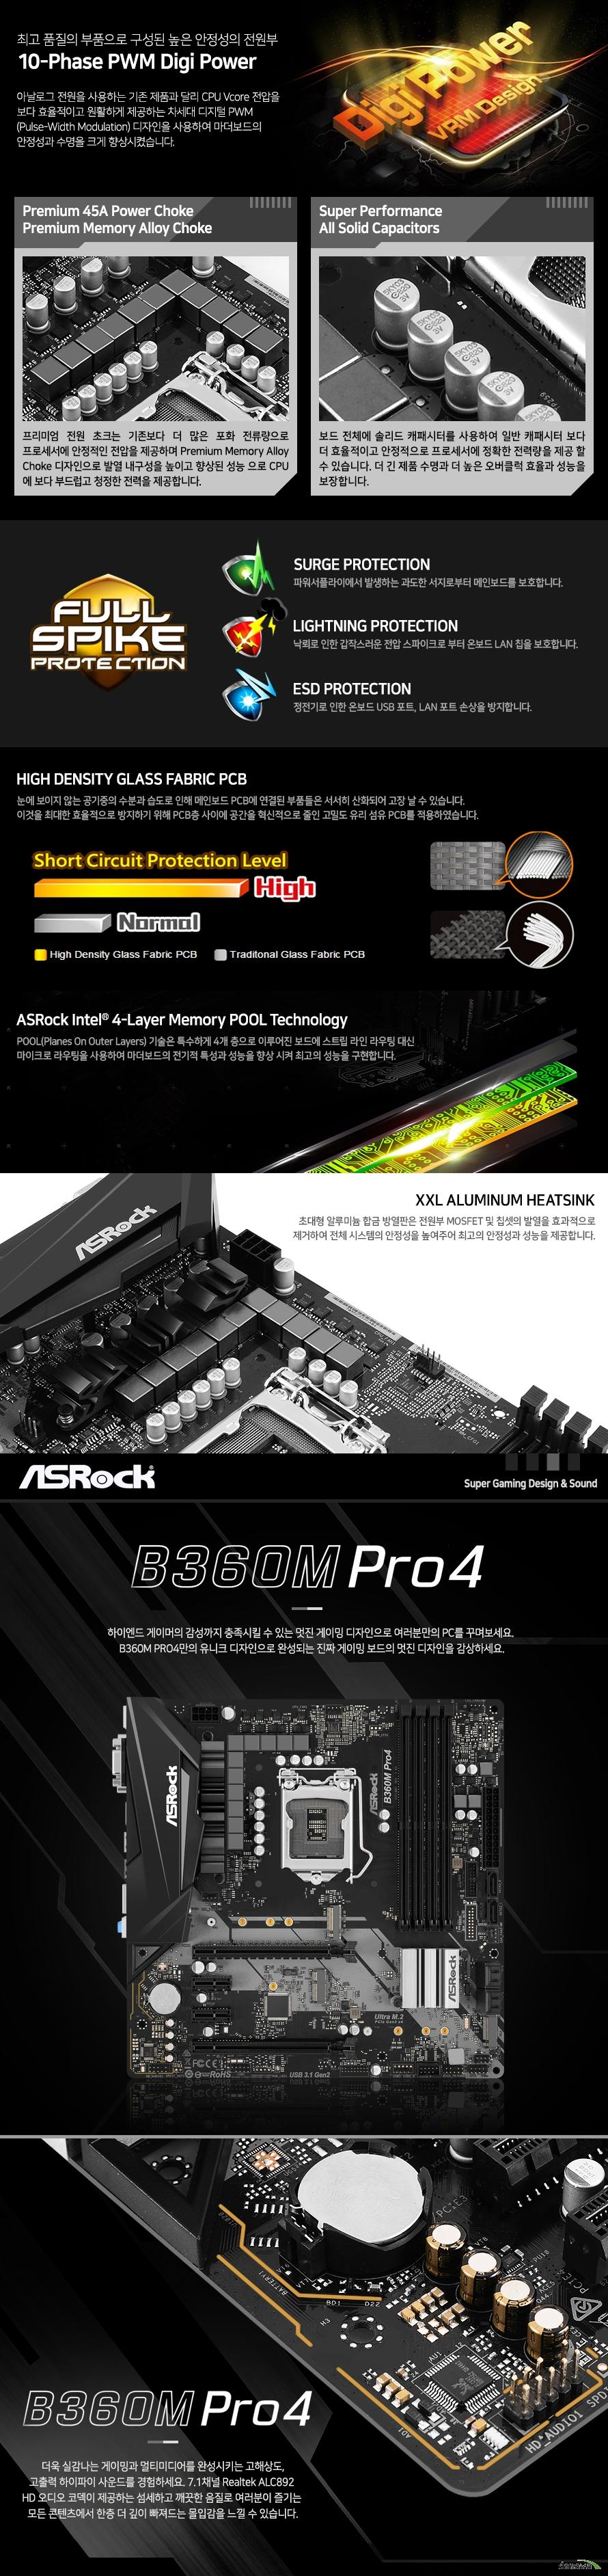 ASRock  B360M PRO4 에즈윈